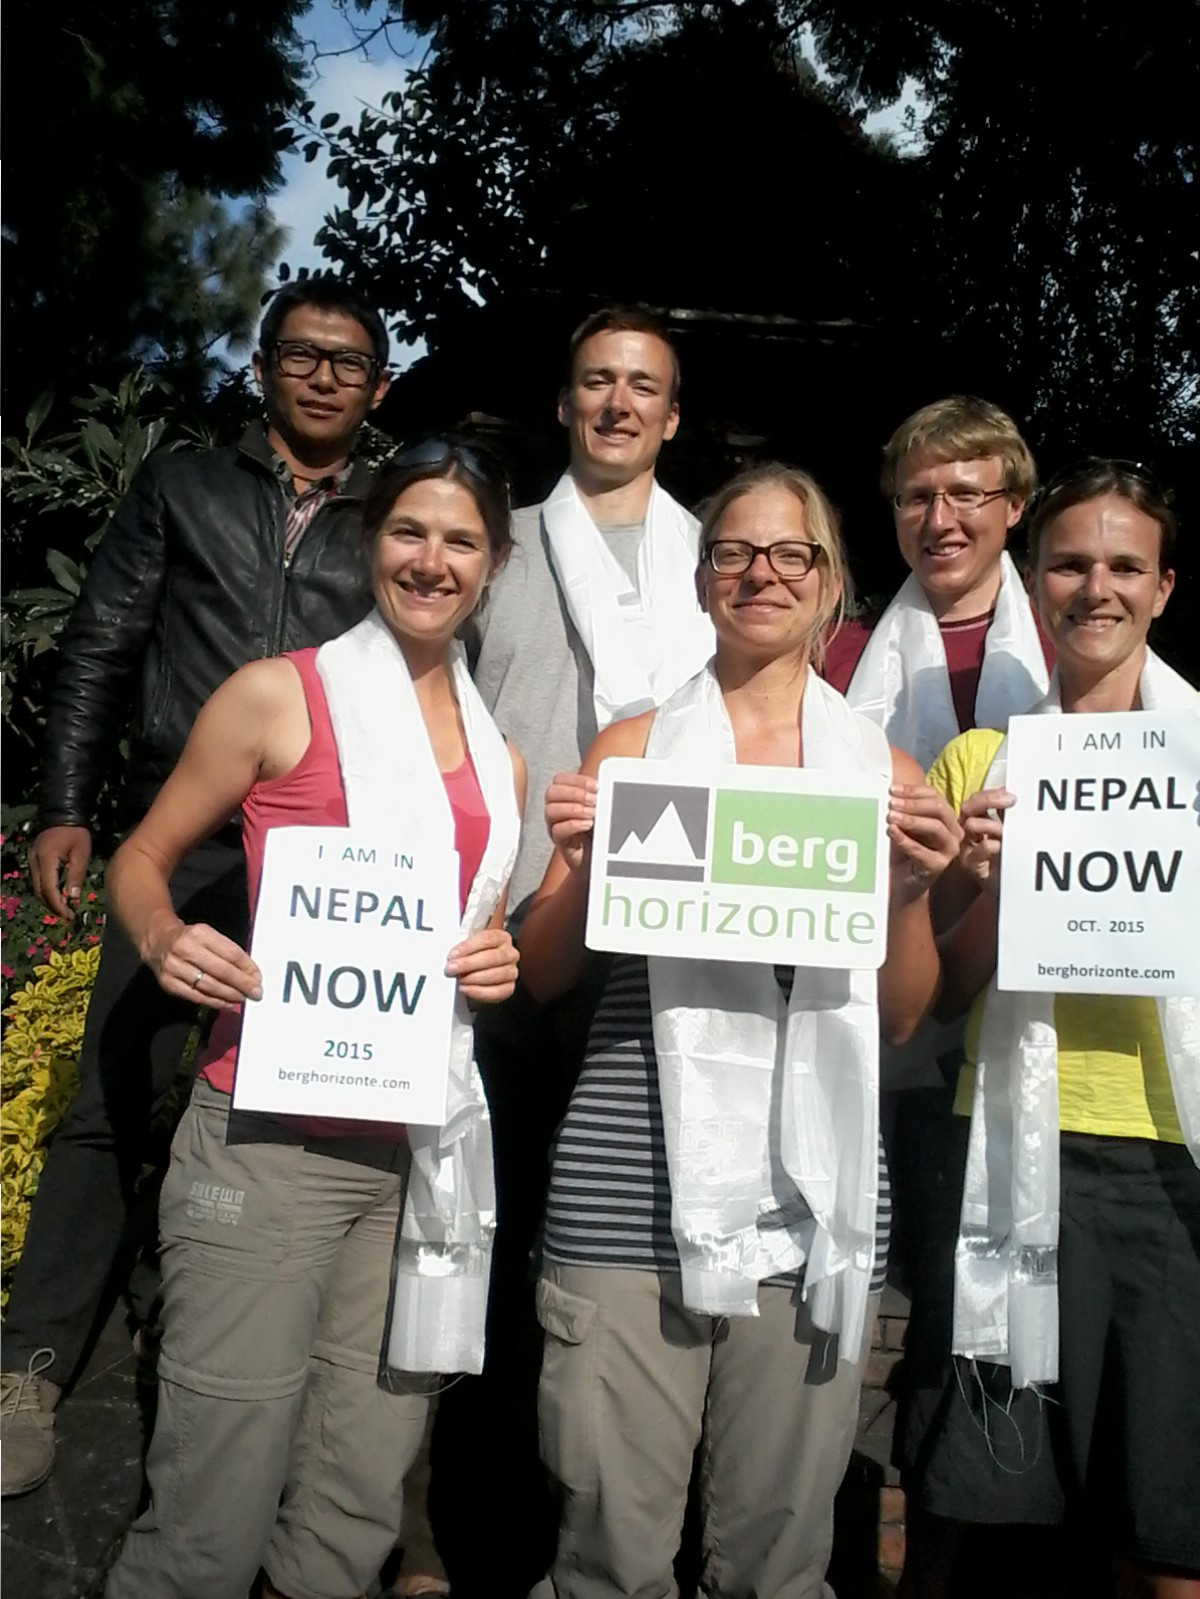 Nepal berghorizonte Gäste im Herbst 2015 |